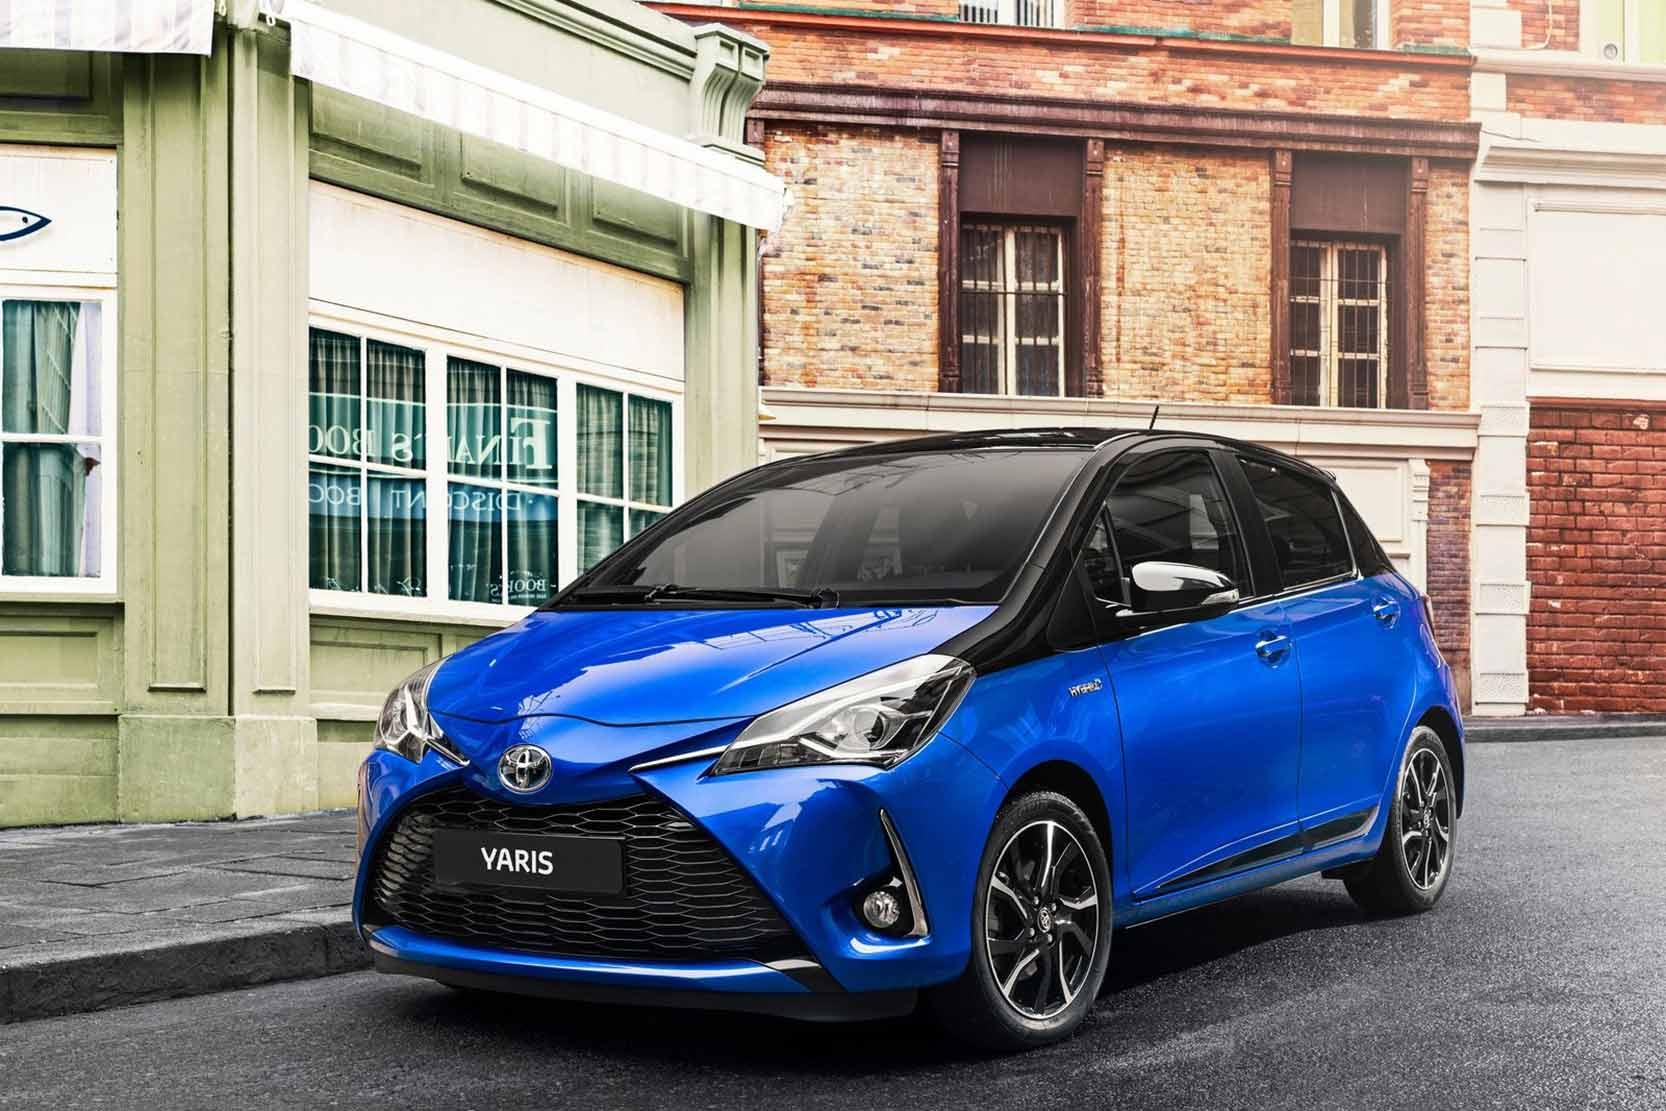 Fiche technique Toyota Yaris 1.0 VVT-i 72 2019